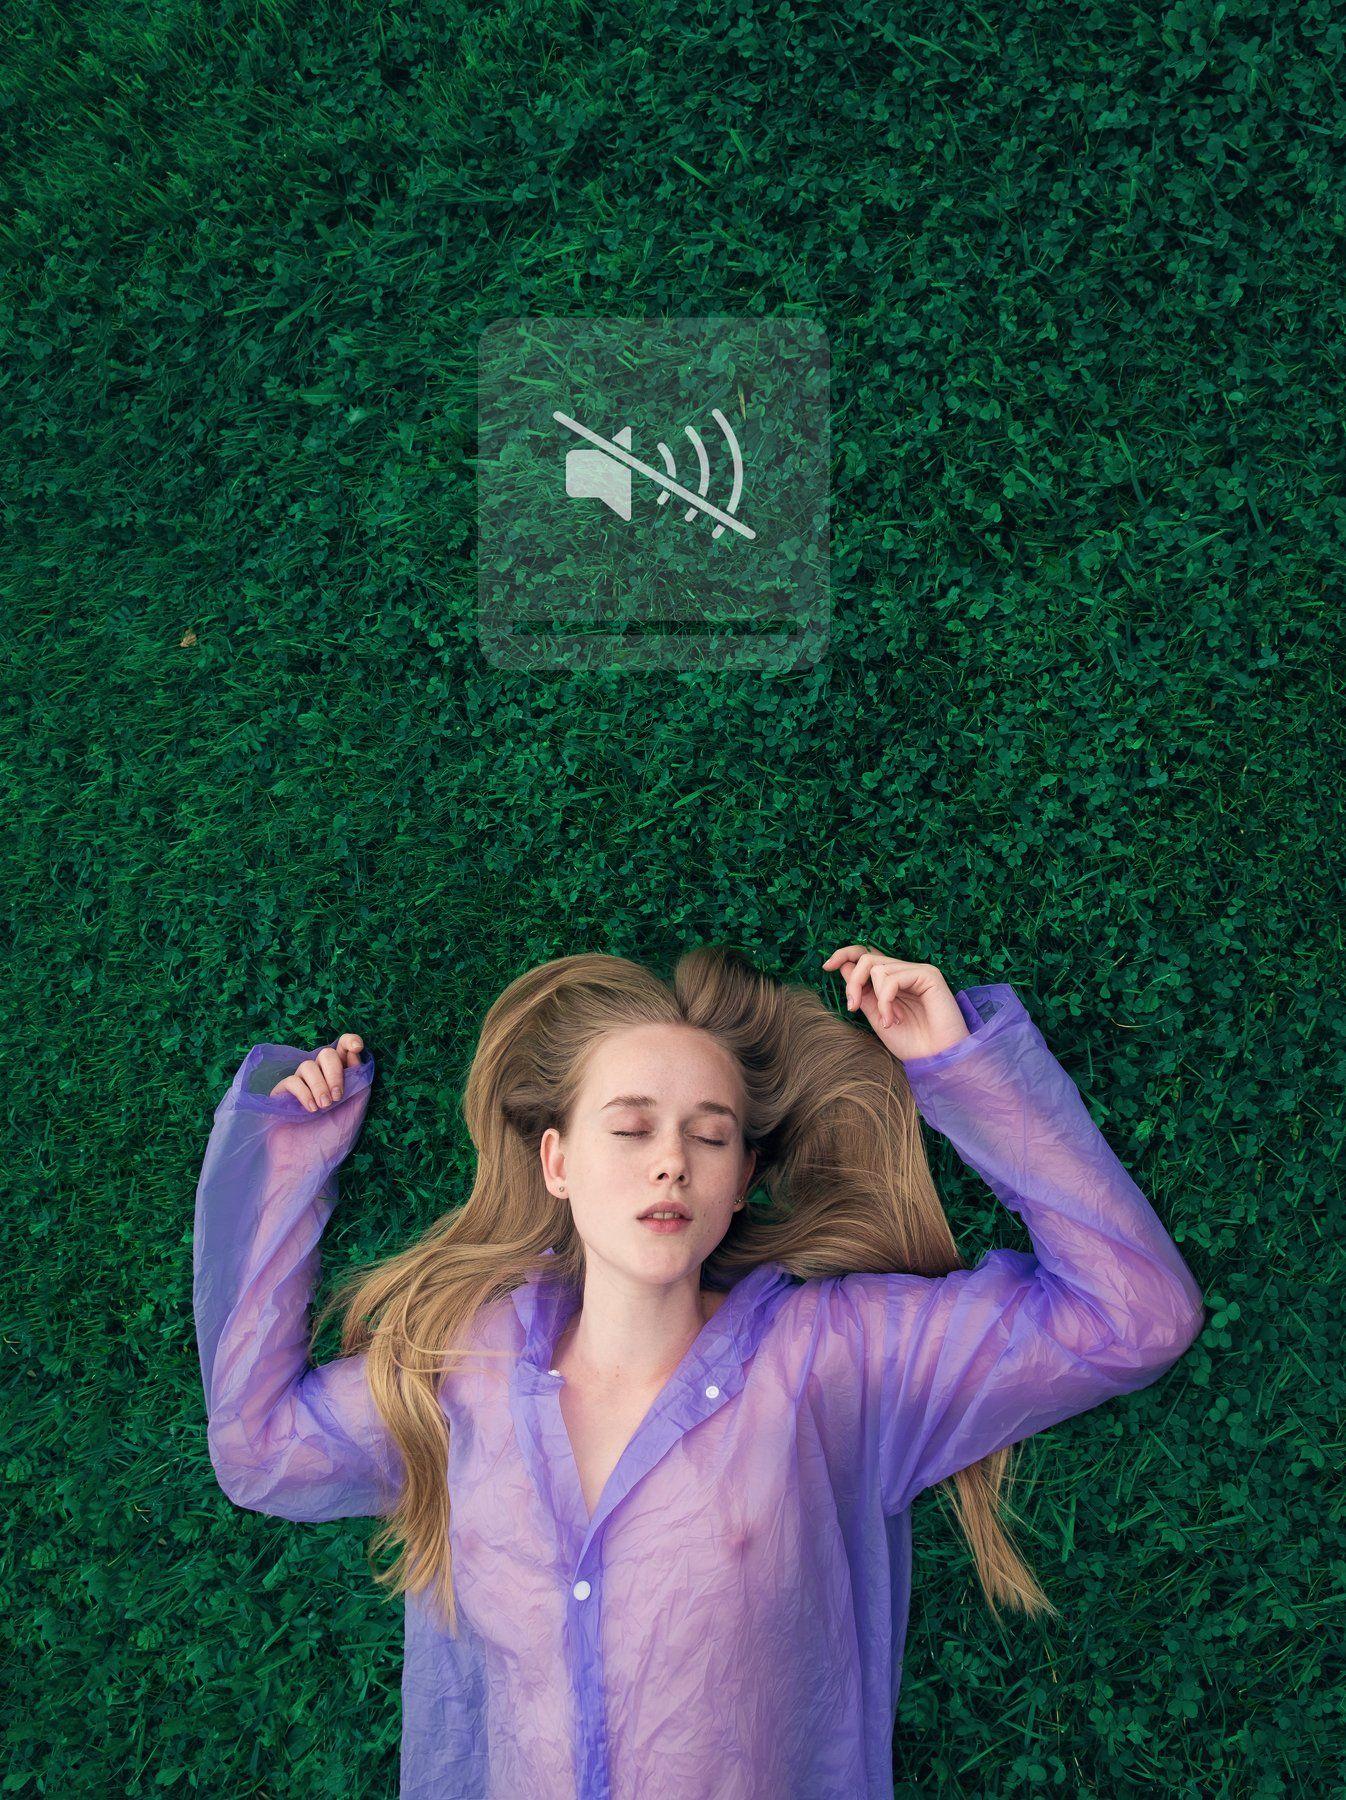 girl, nude, grass, silence, hush, saint-petersburg, , Роман Филиппов